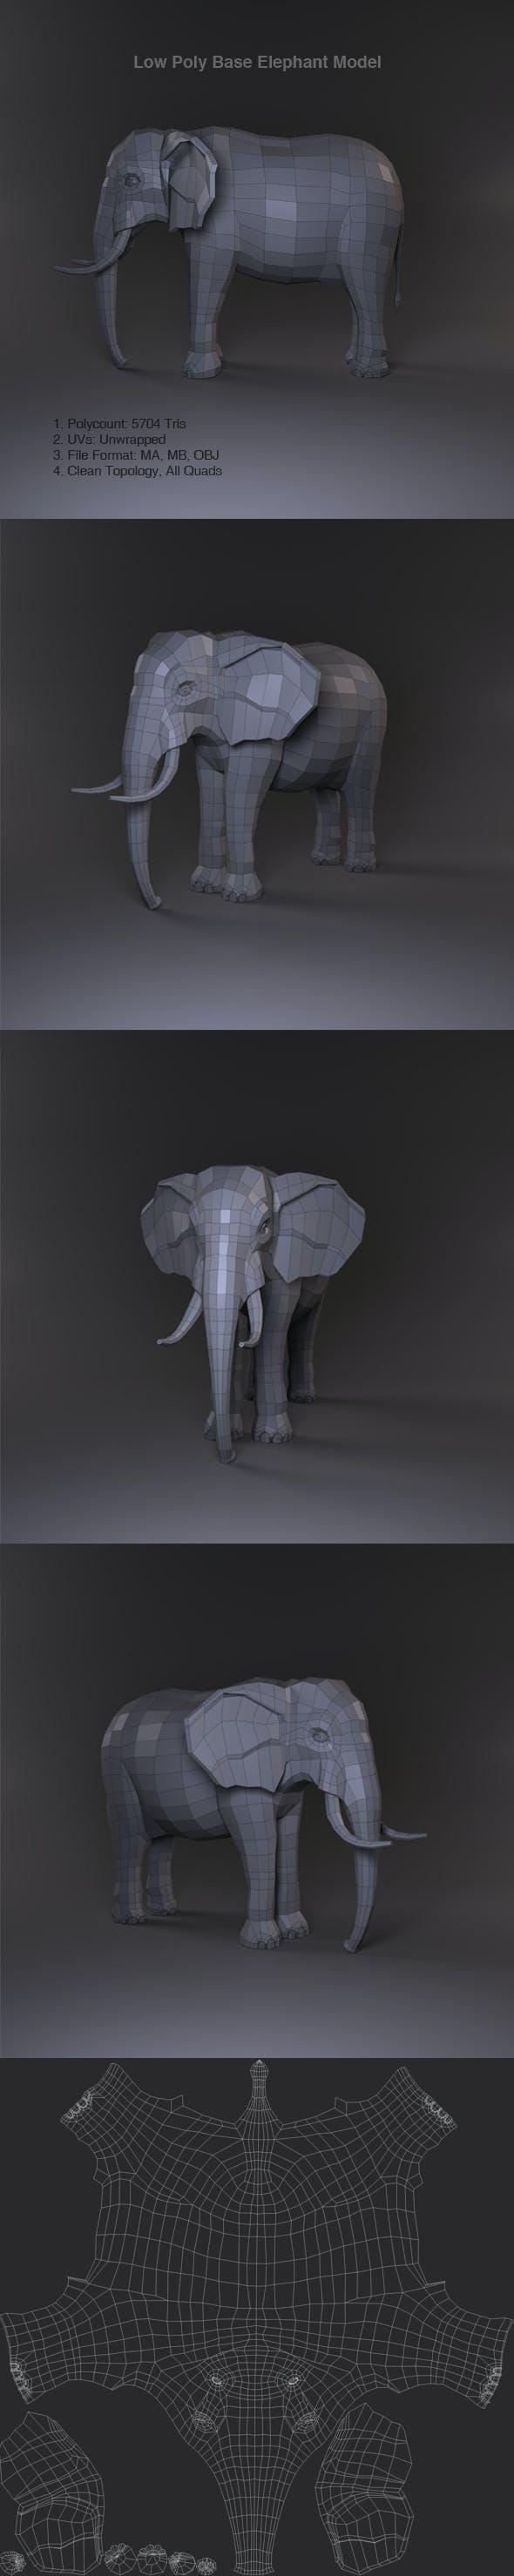 Low Poly Base Elephant Model - 3DOcean Item for Sale